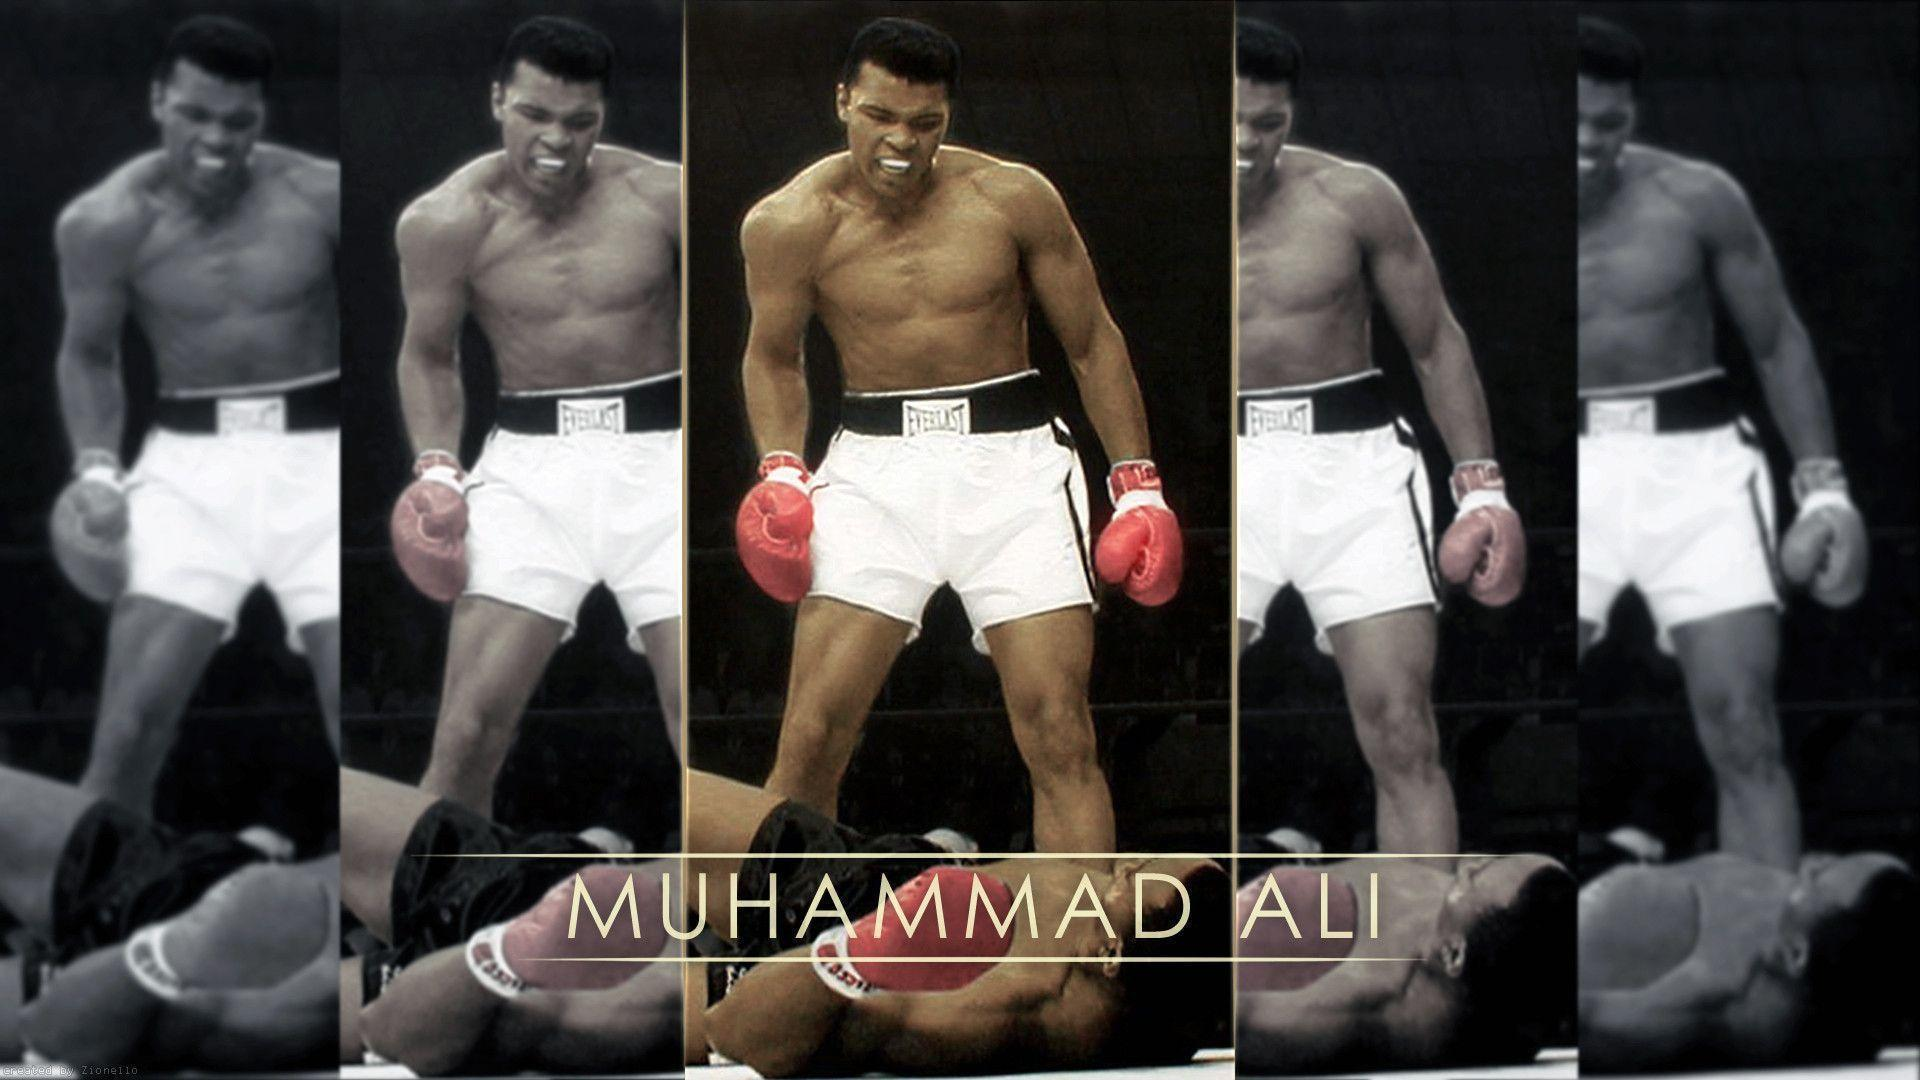 Muhammad Ali Wallpapers Wallpaper Cave